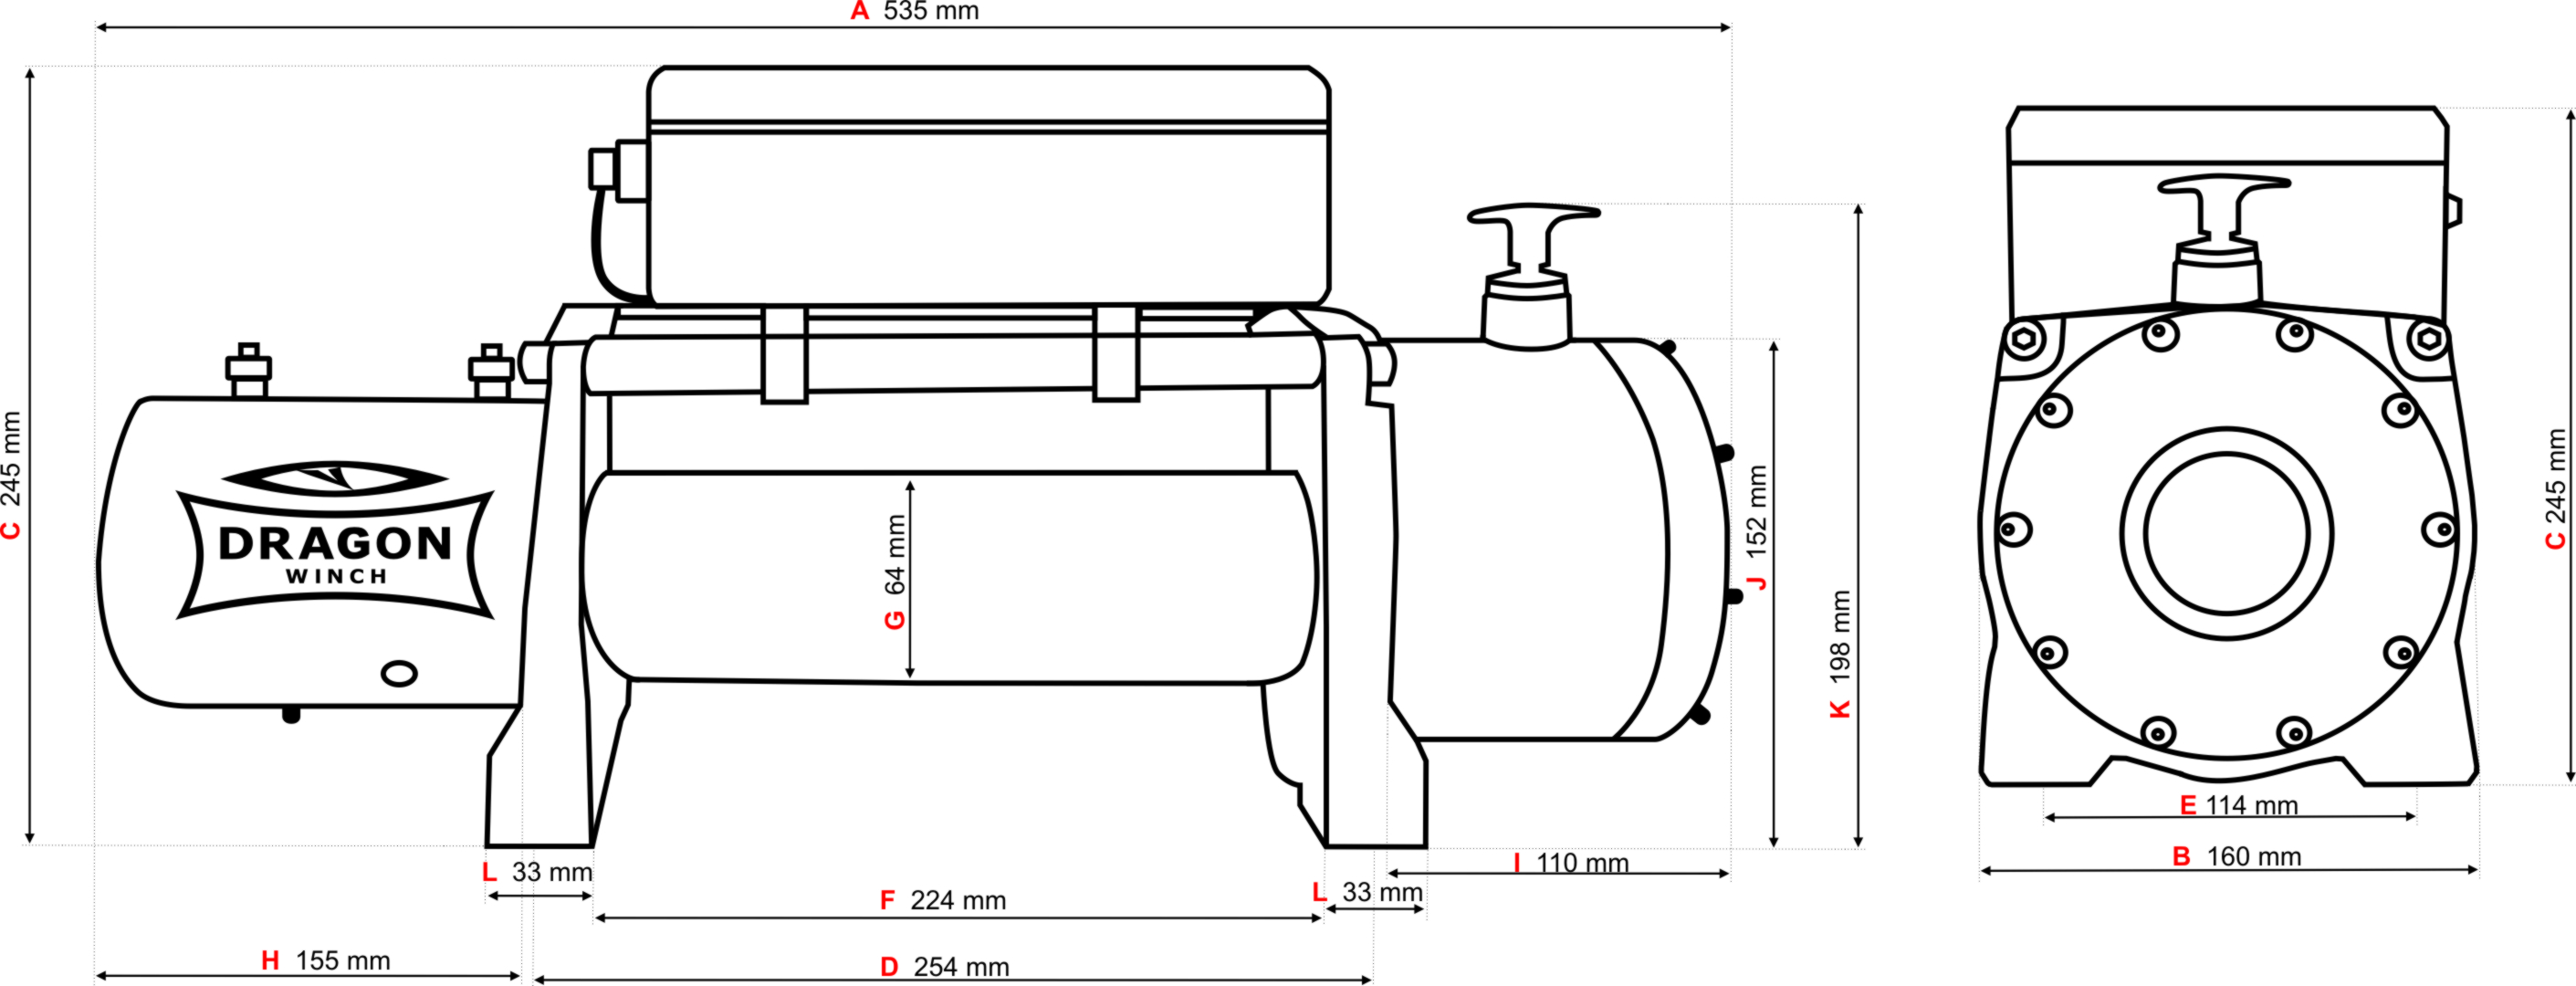 Dragon Winch Wiring Diagram Quick Start Guide Of 12v Switch Diagrams Source Rh 13 18 4 Ludwiglab De Warn 8000